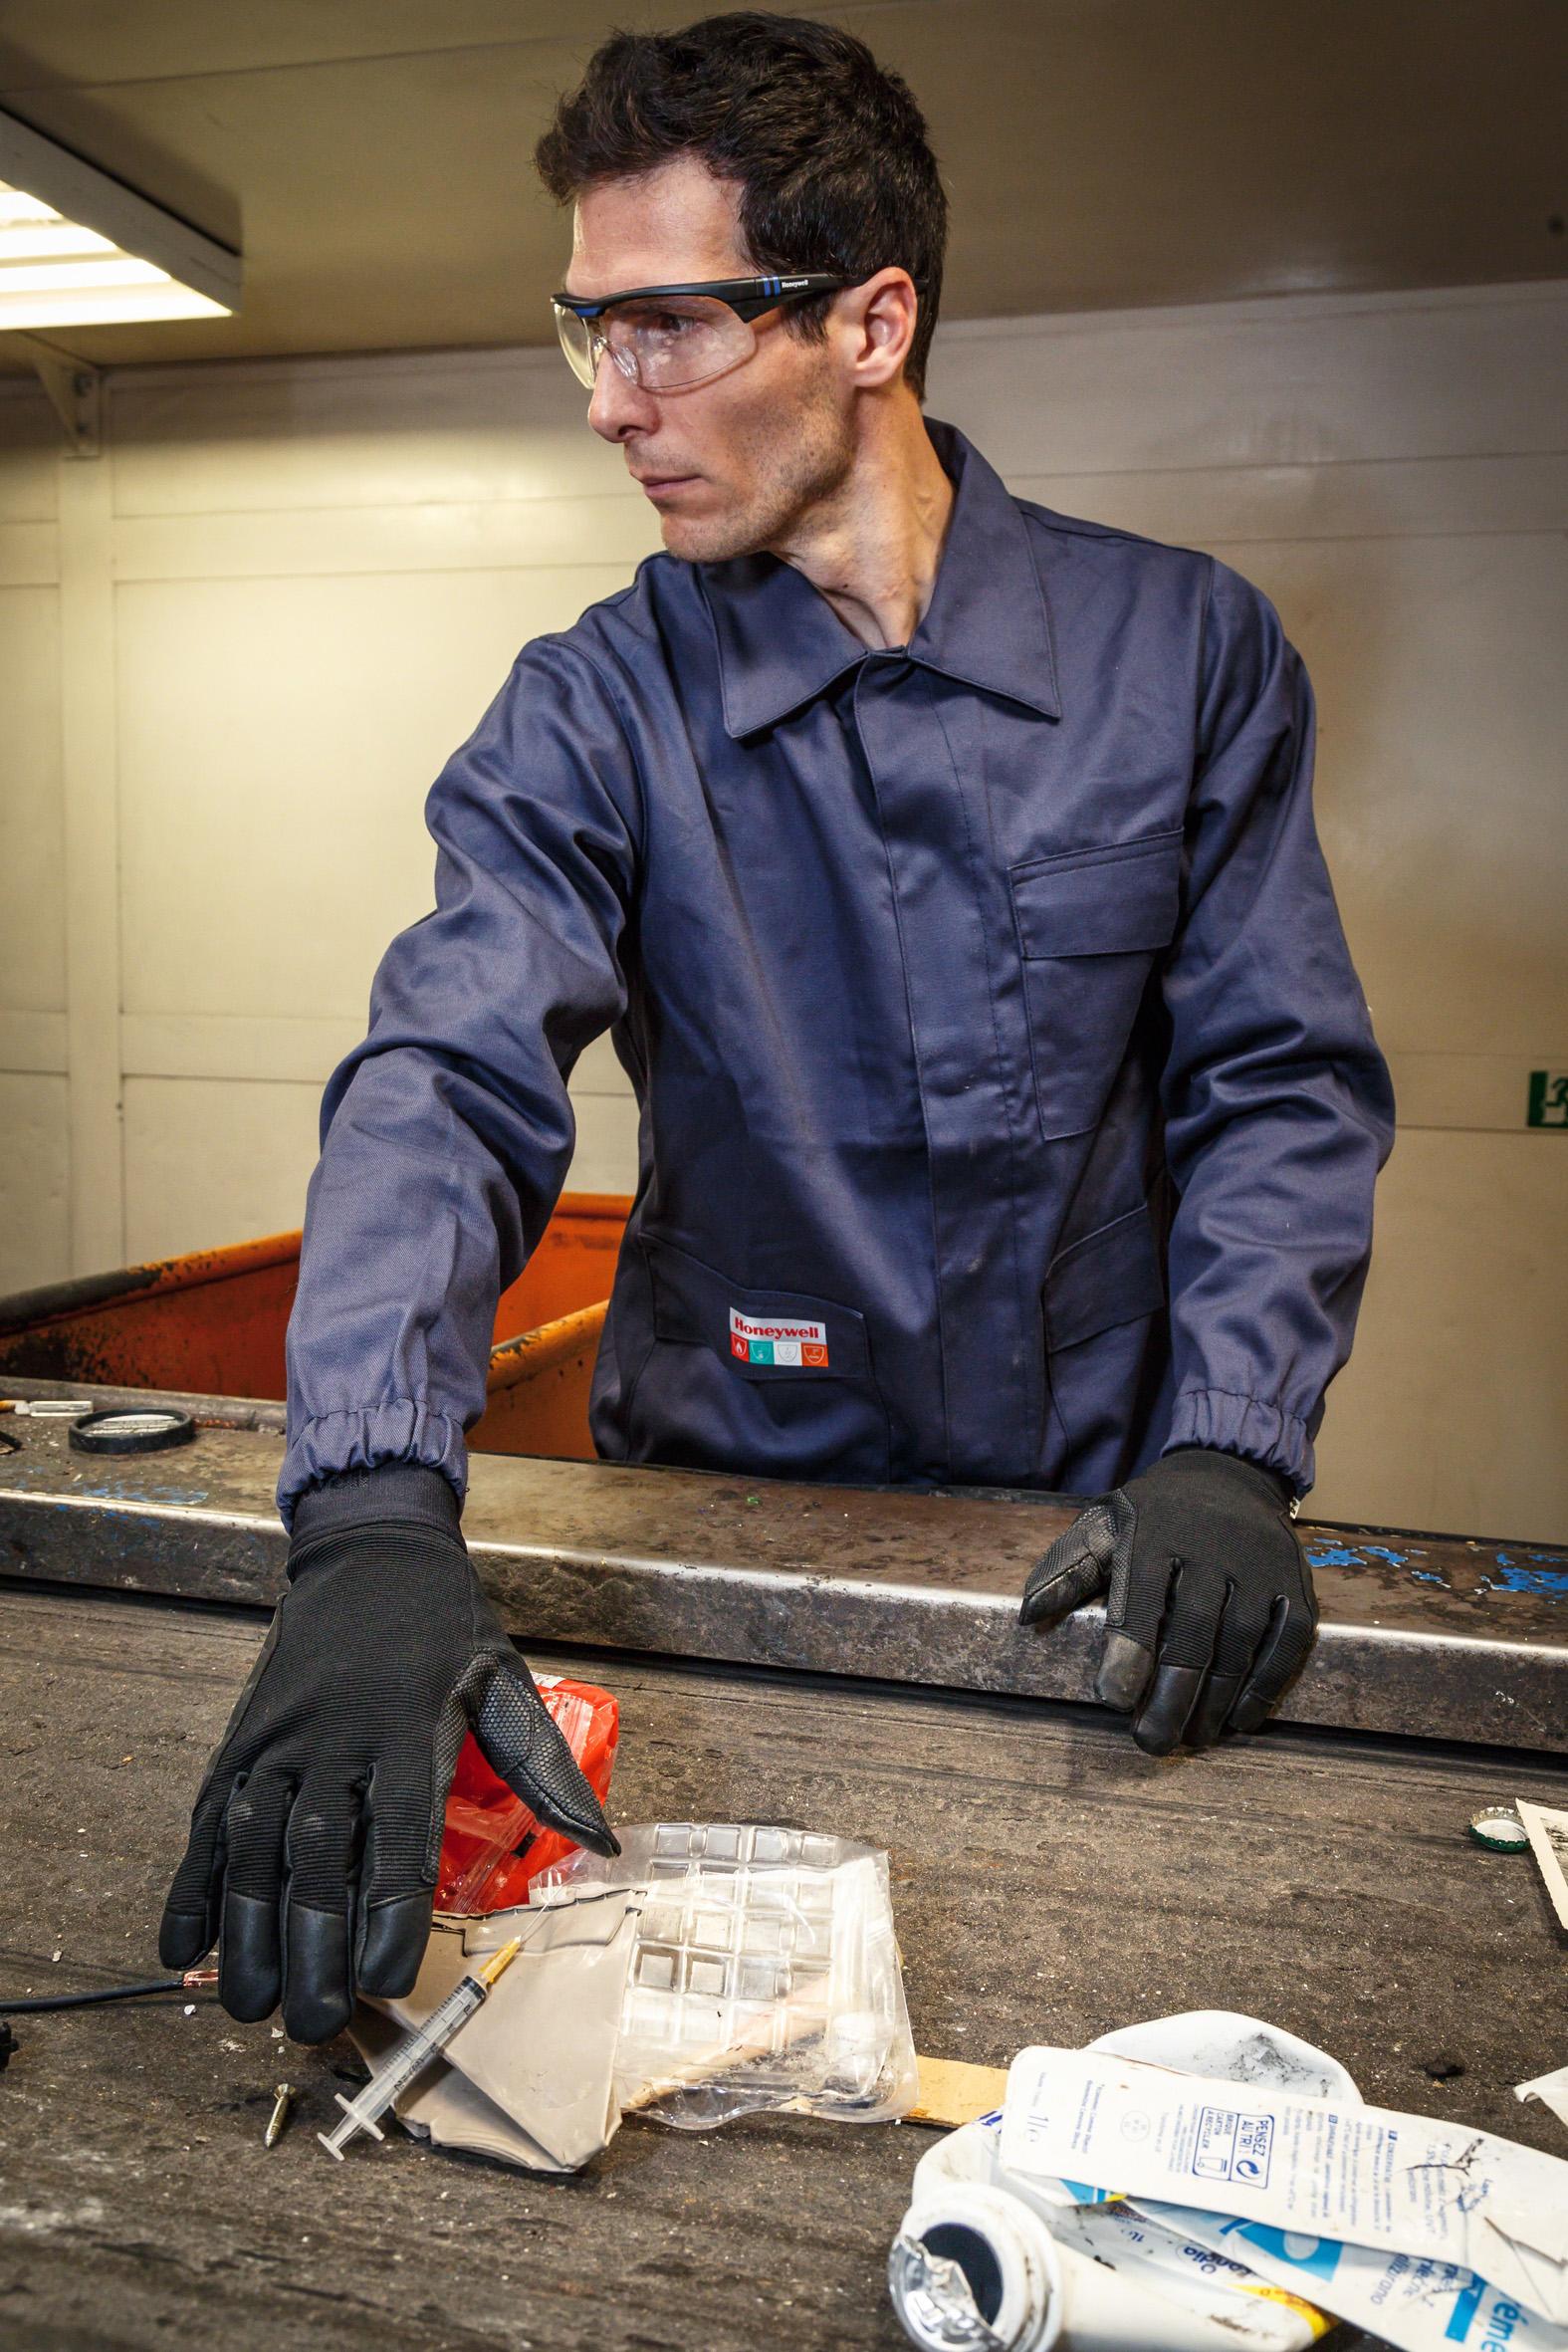 Using needle stick resistant gloves